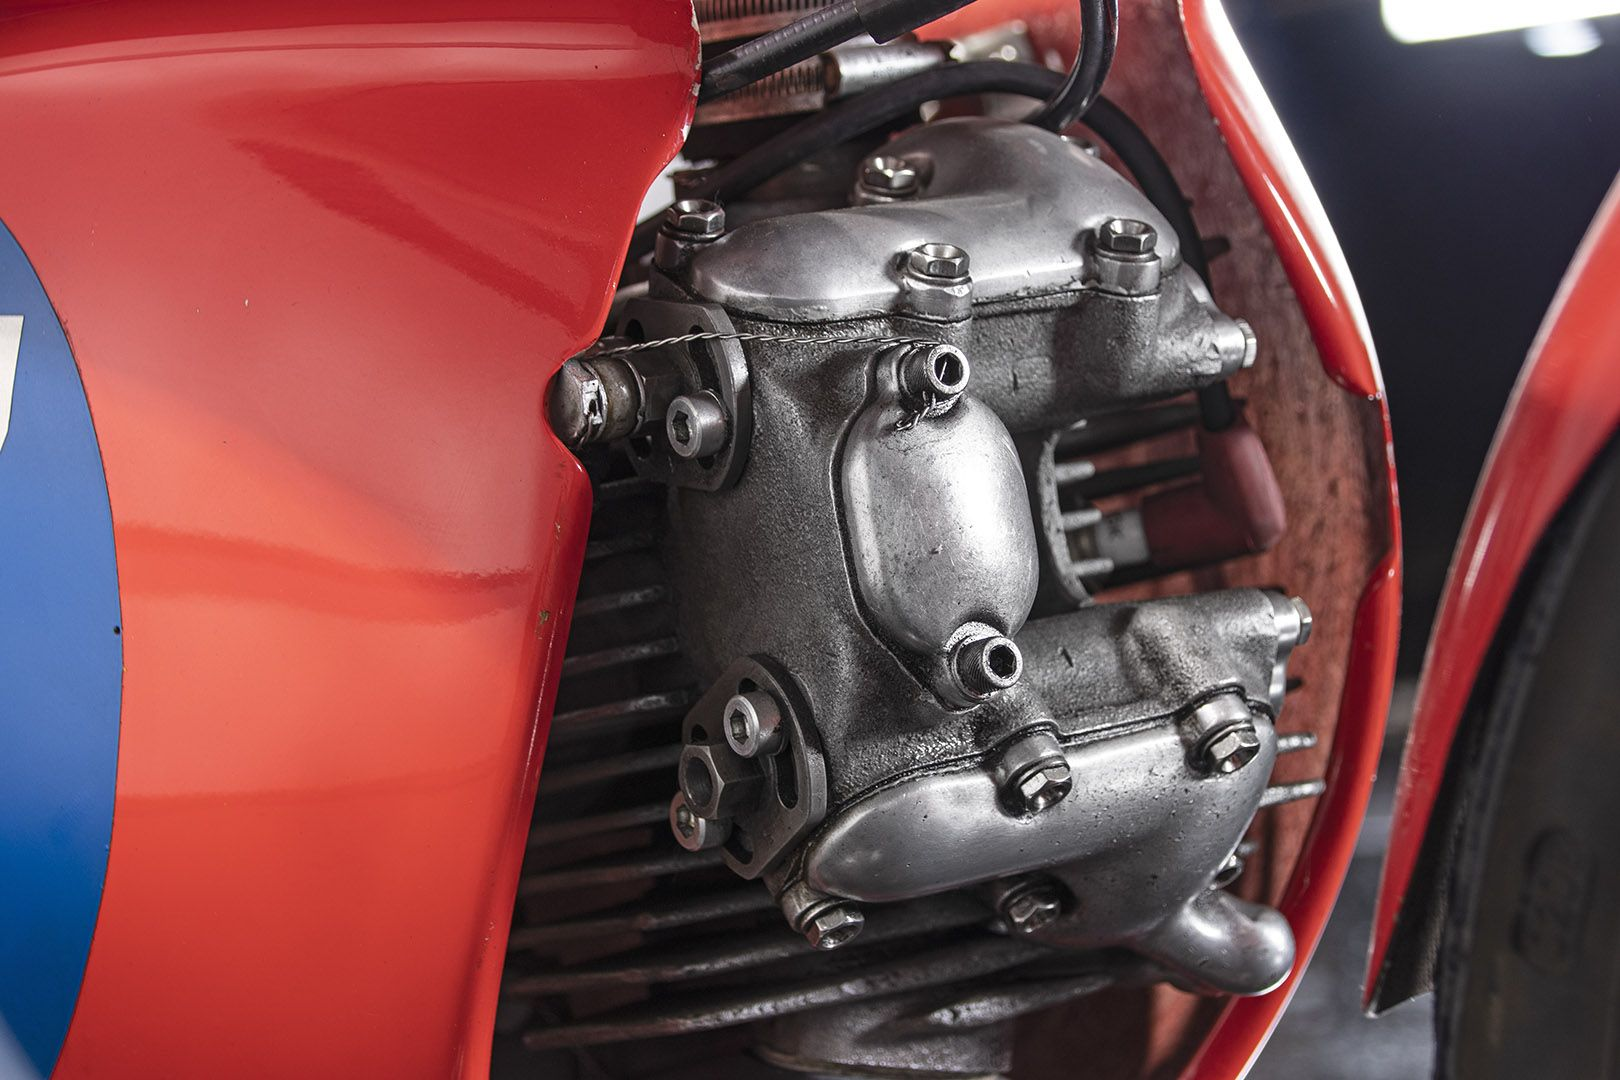 1969 Aermacchi Harley-Davidson 350 Ala d'oro 61128